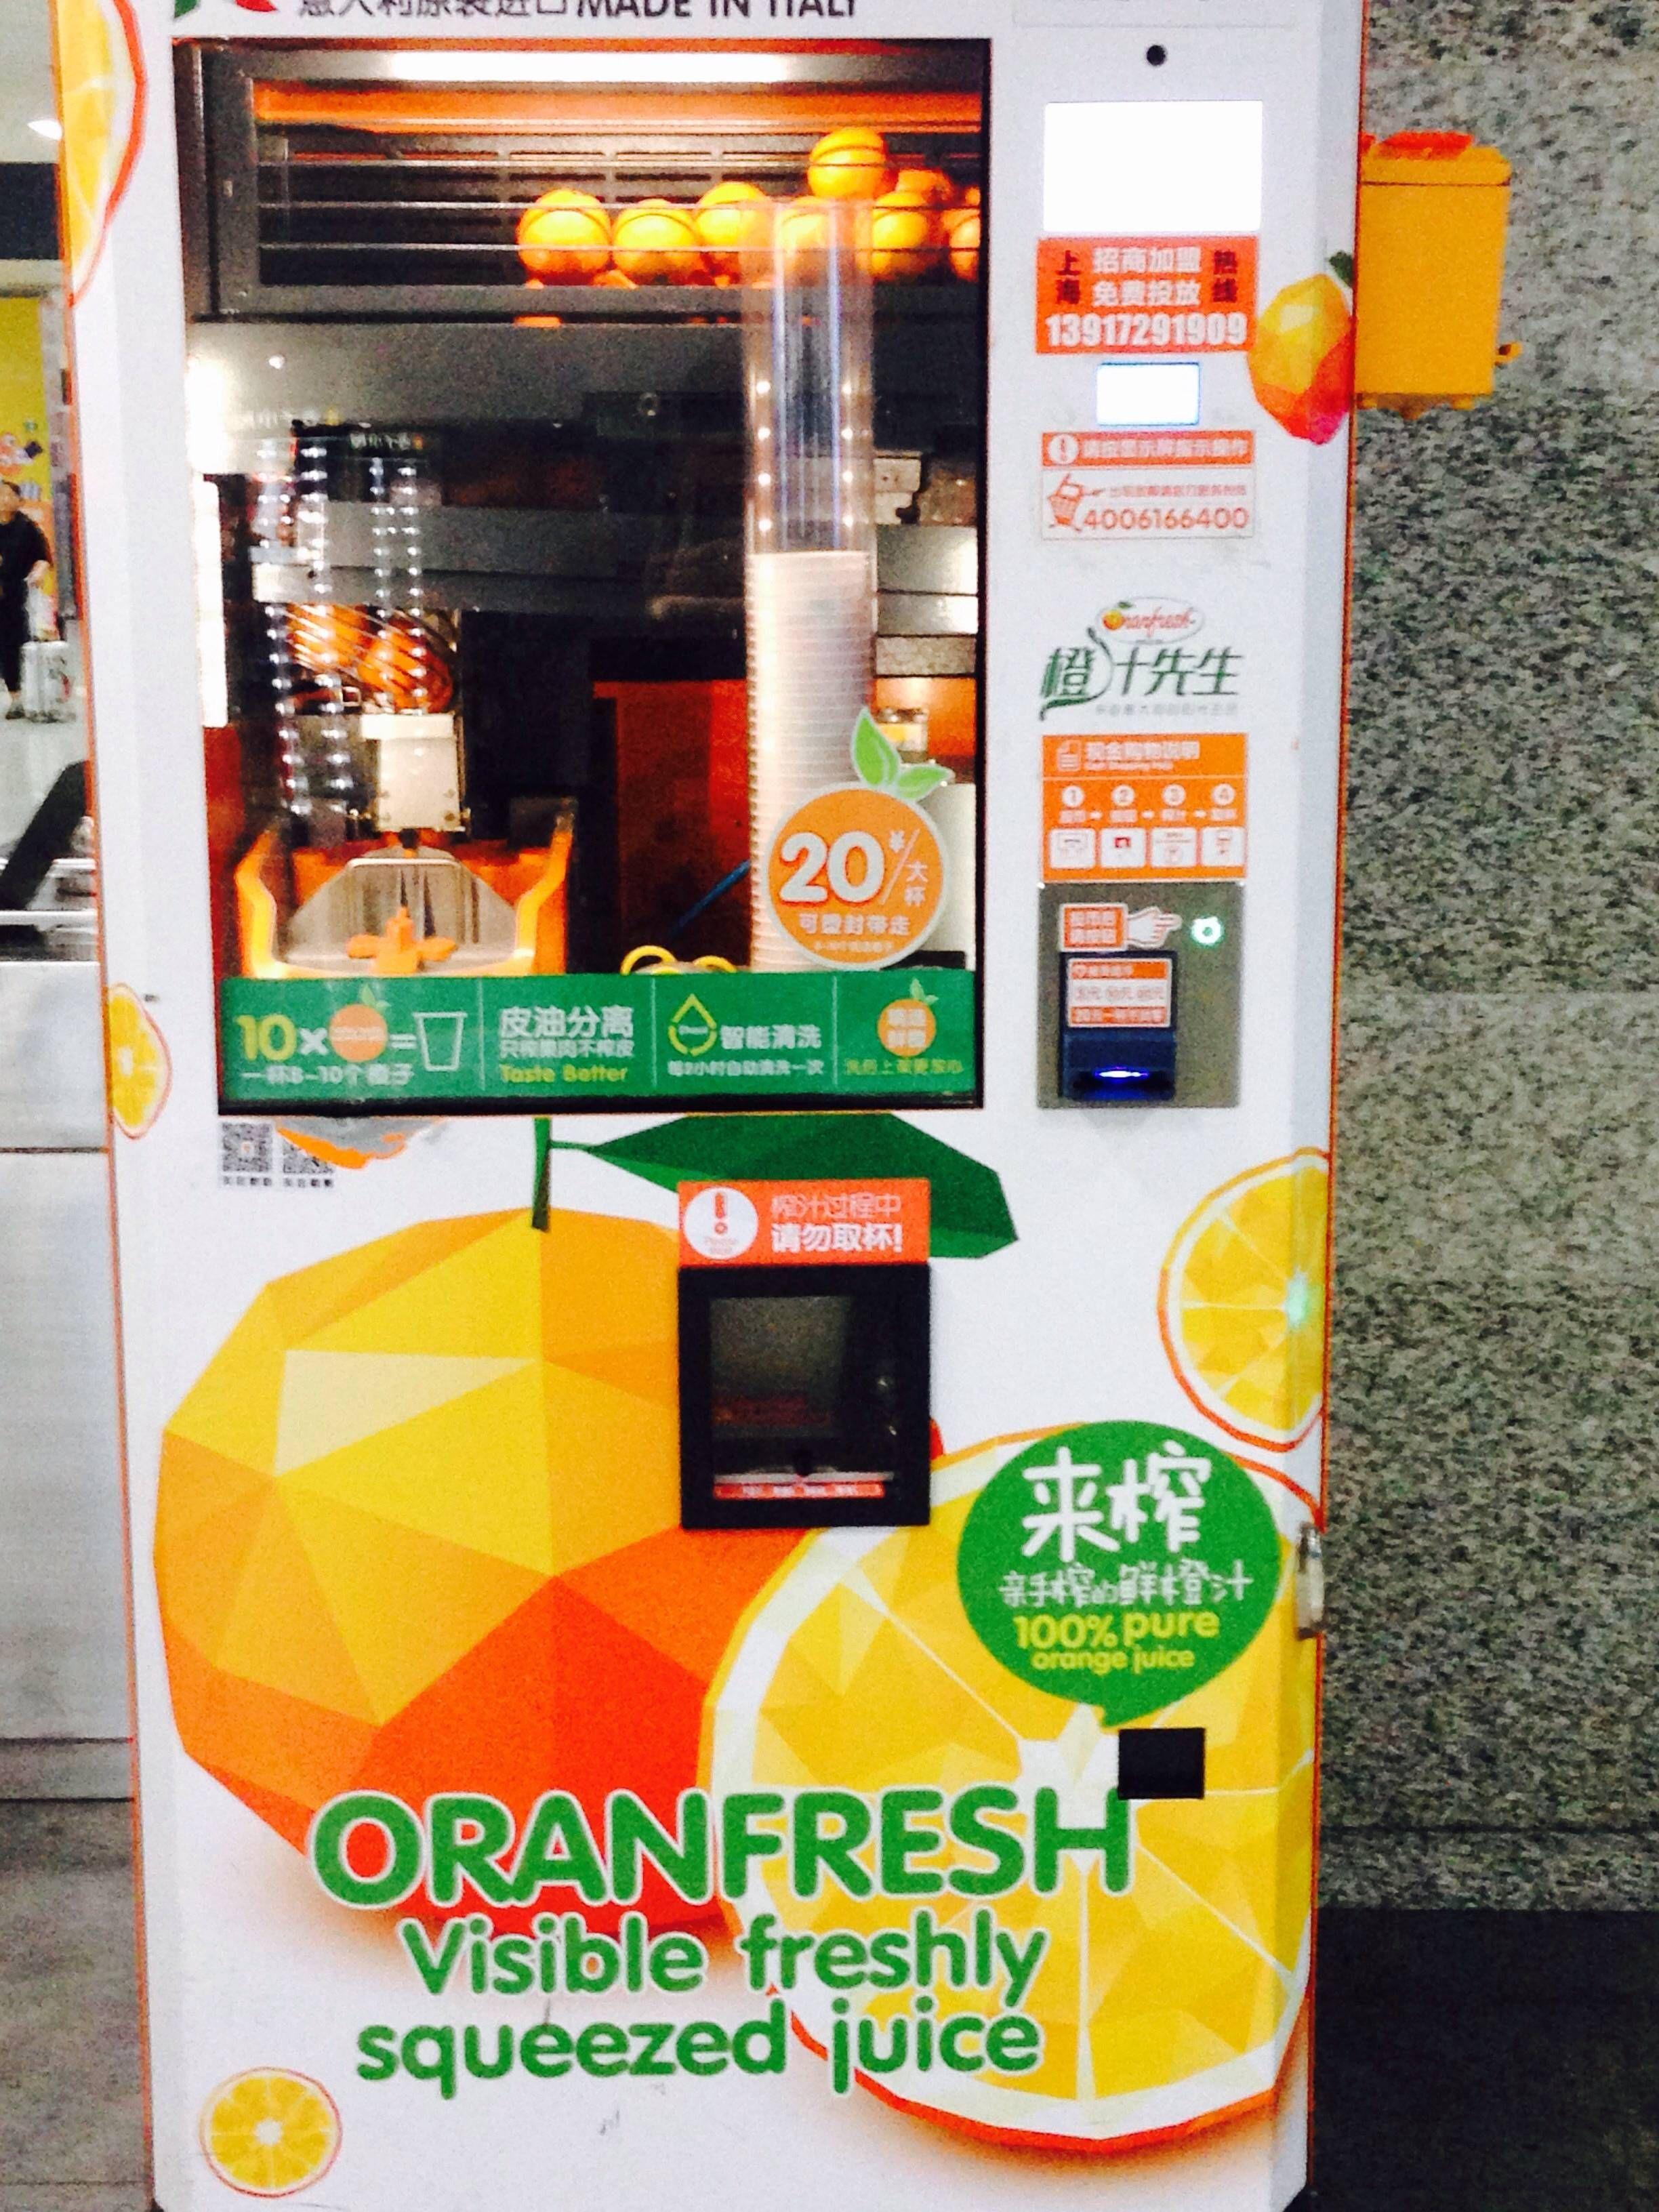 Fresh Orange Juice Vending Machine In 2019 Ibs Inspiration